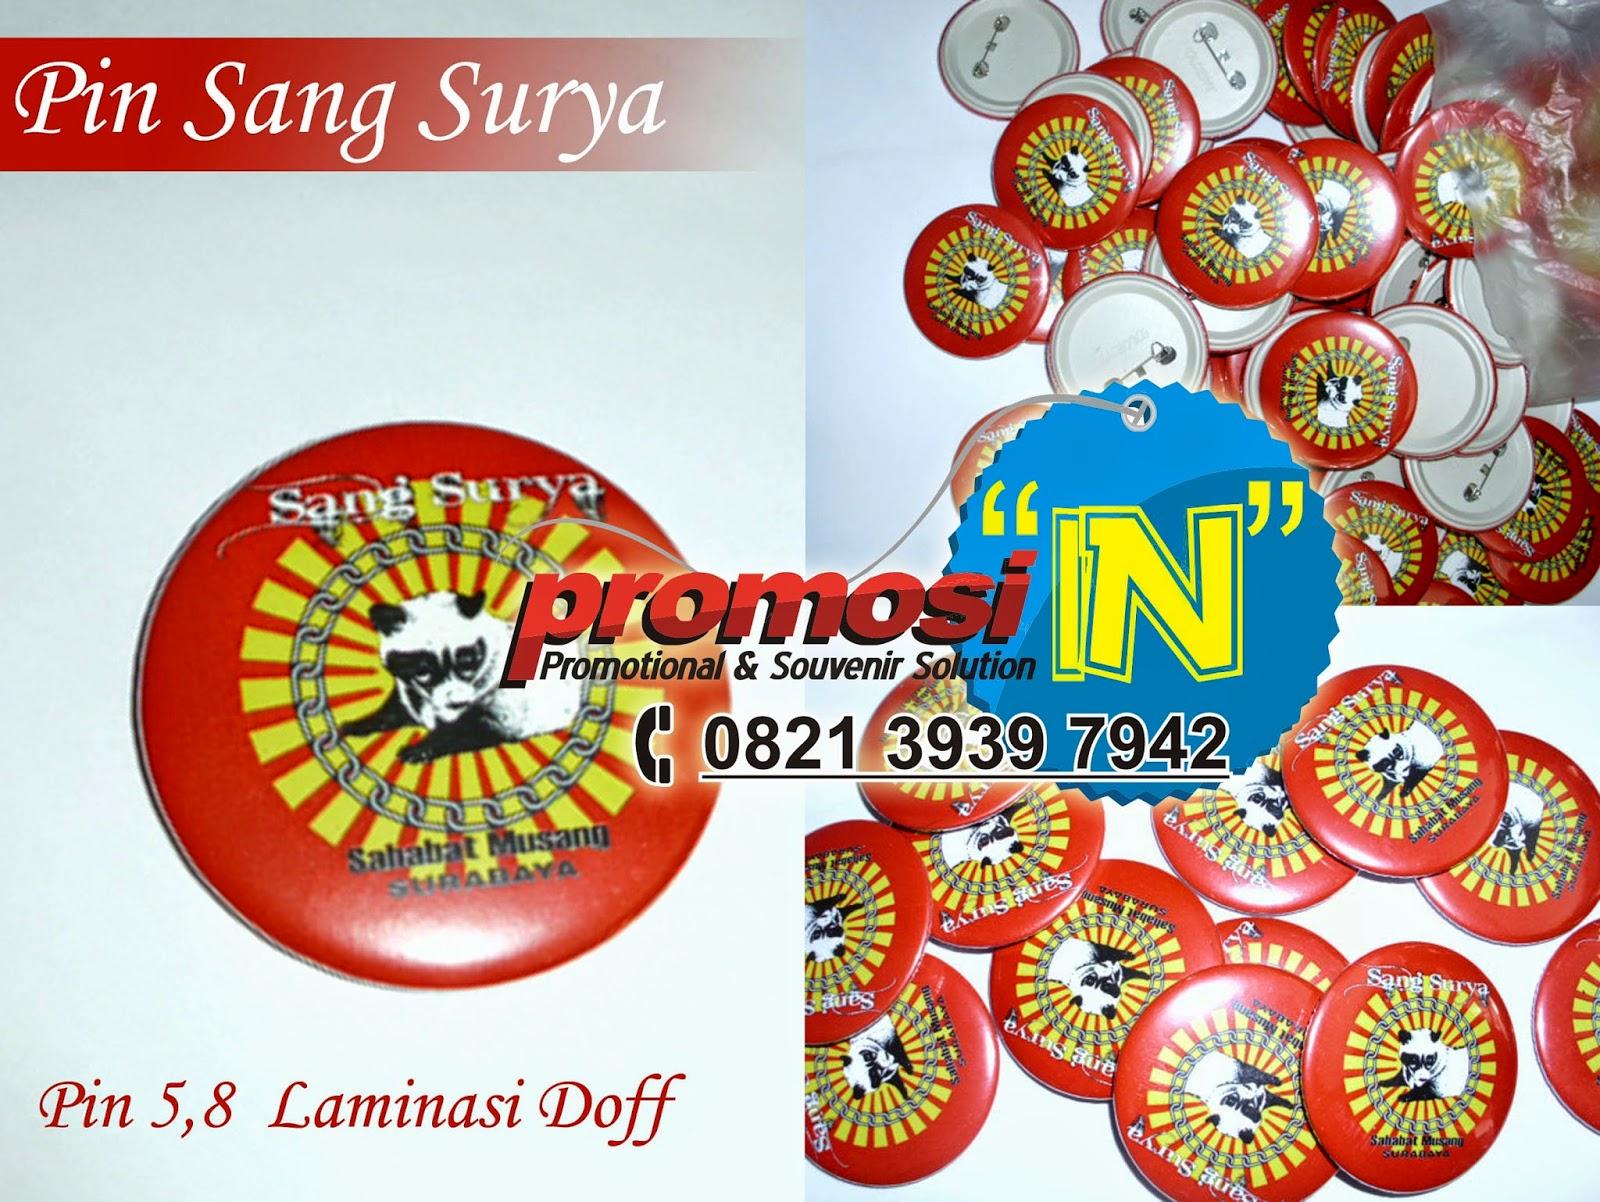 Pabrik Pin Online, Pin, Pin Desain Sendiri, Pusat Pin Surabaya,